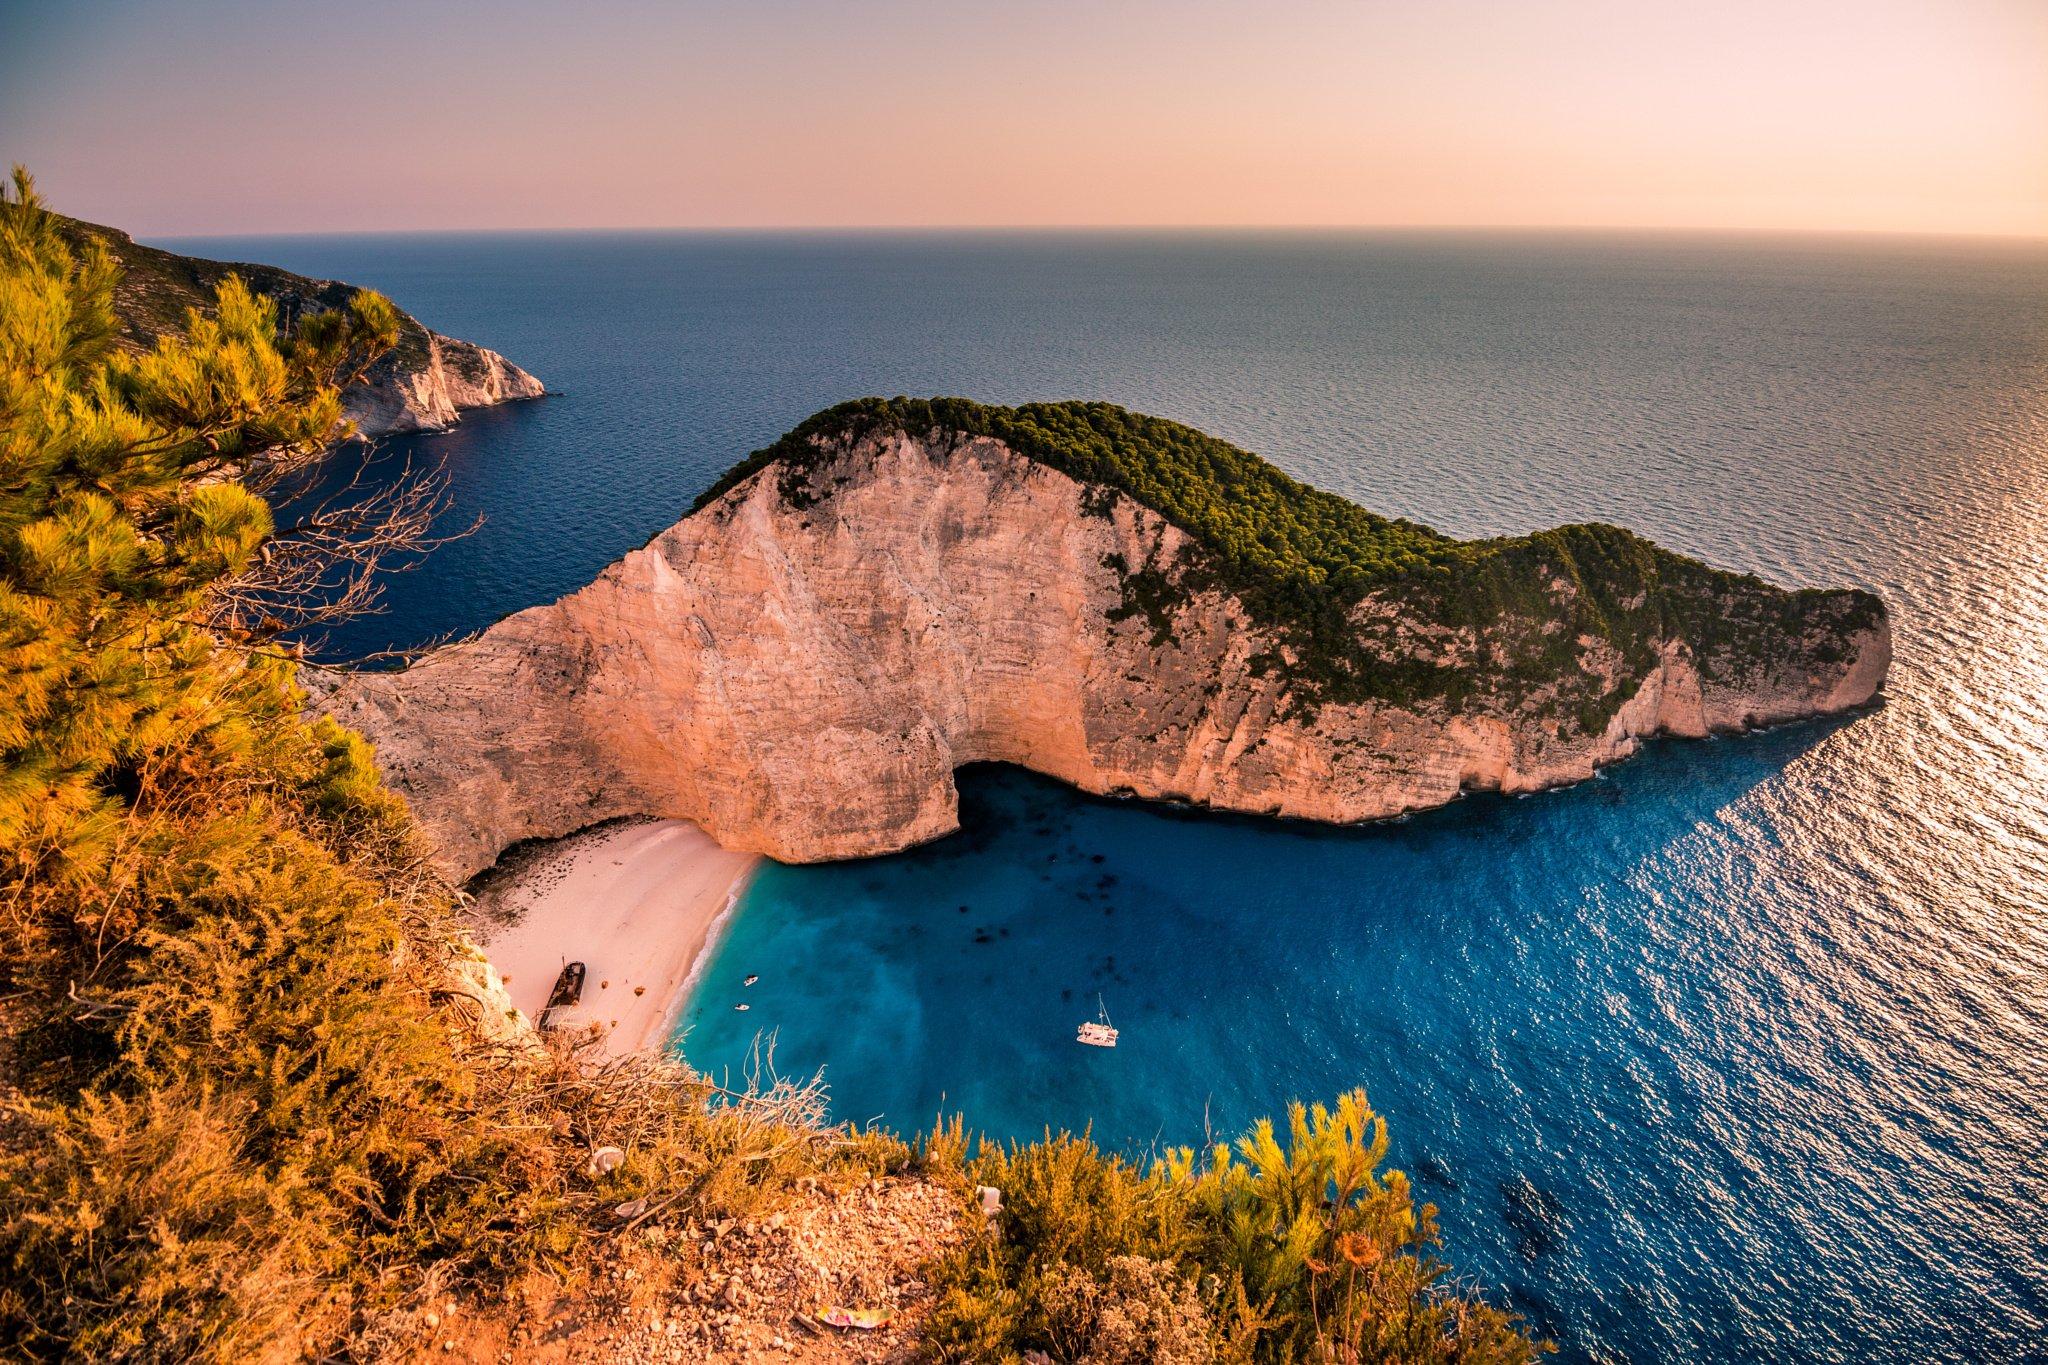 navagio bay greece hd - photo #7